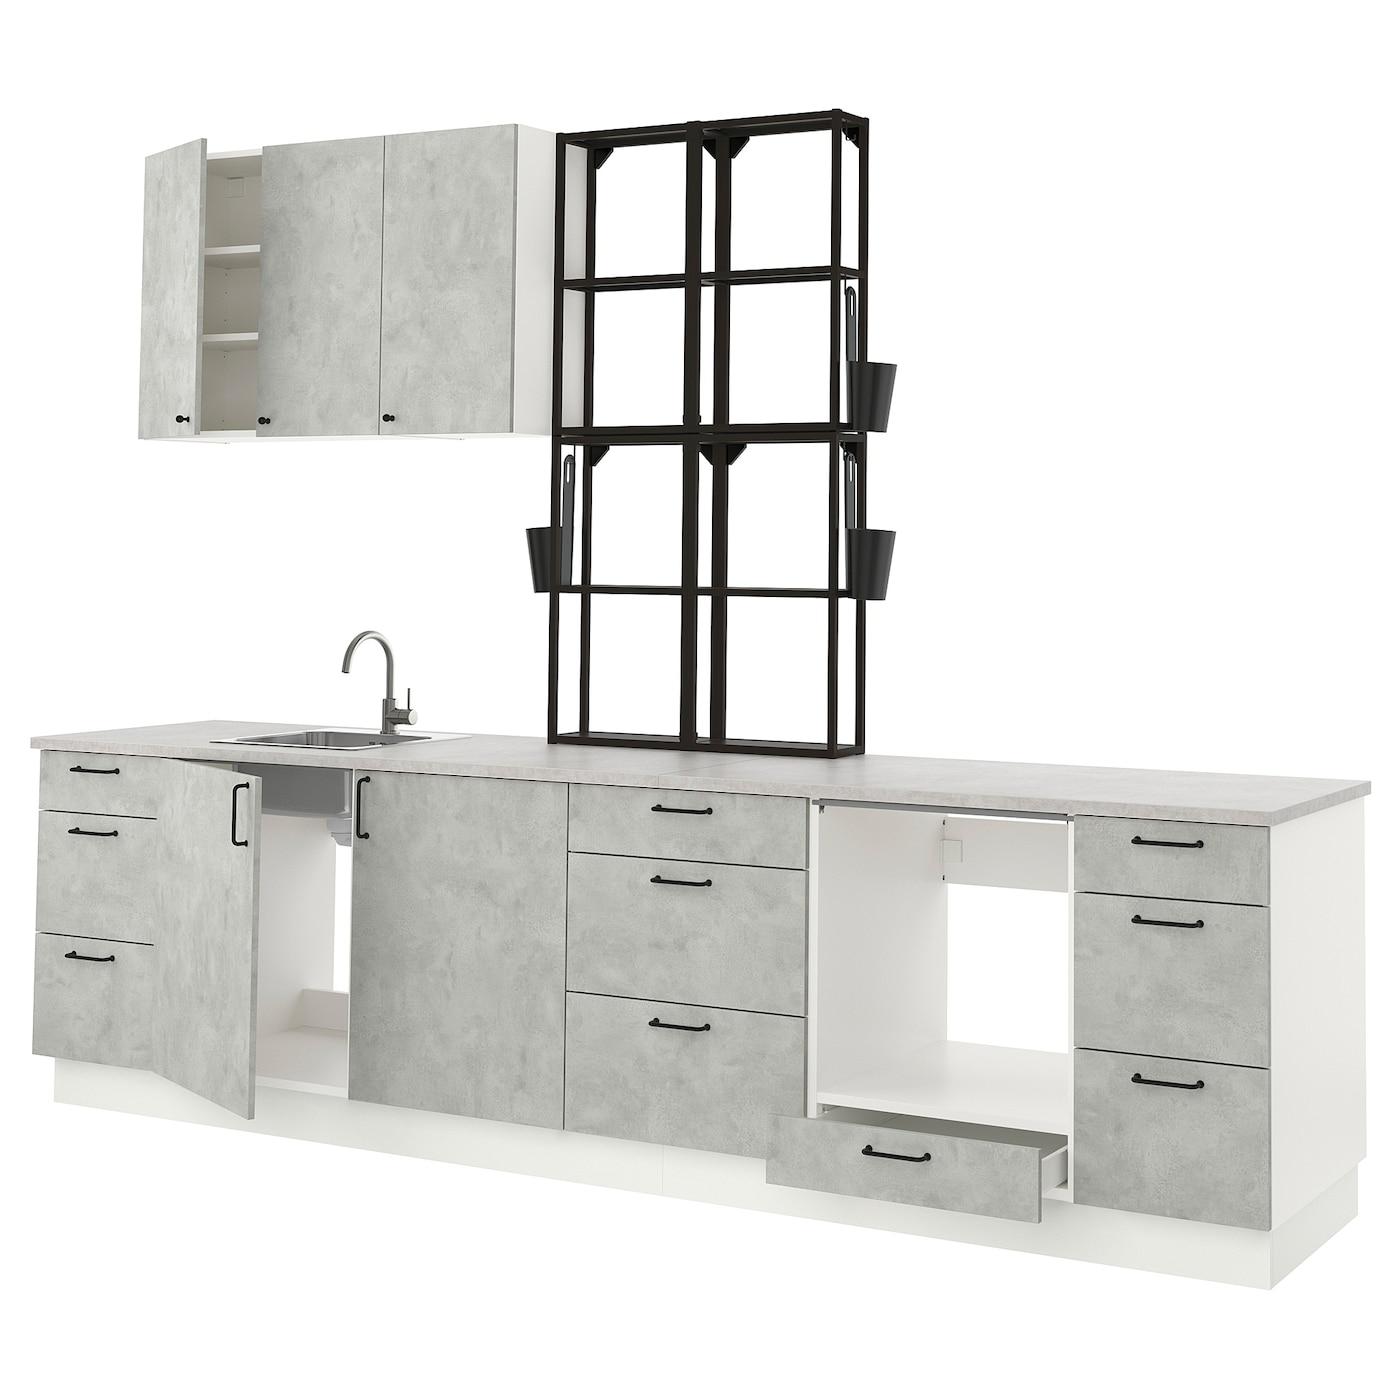 ENHET Küche - anthrazit, Betonmuster - IKEA Deutschland